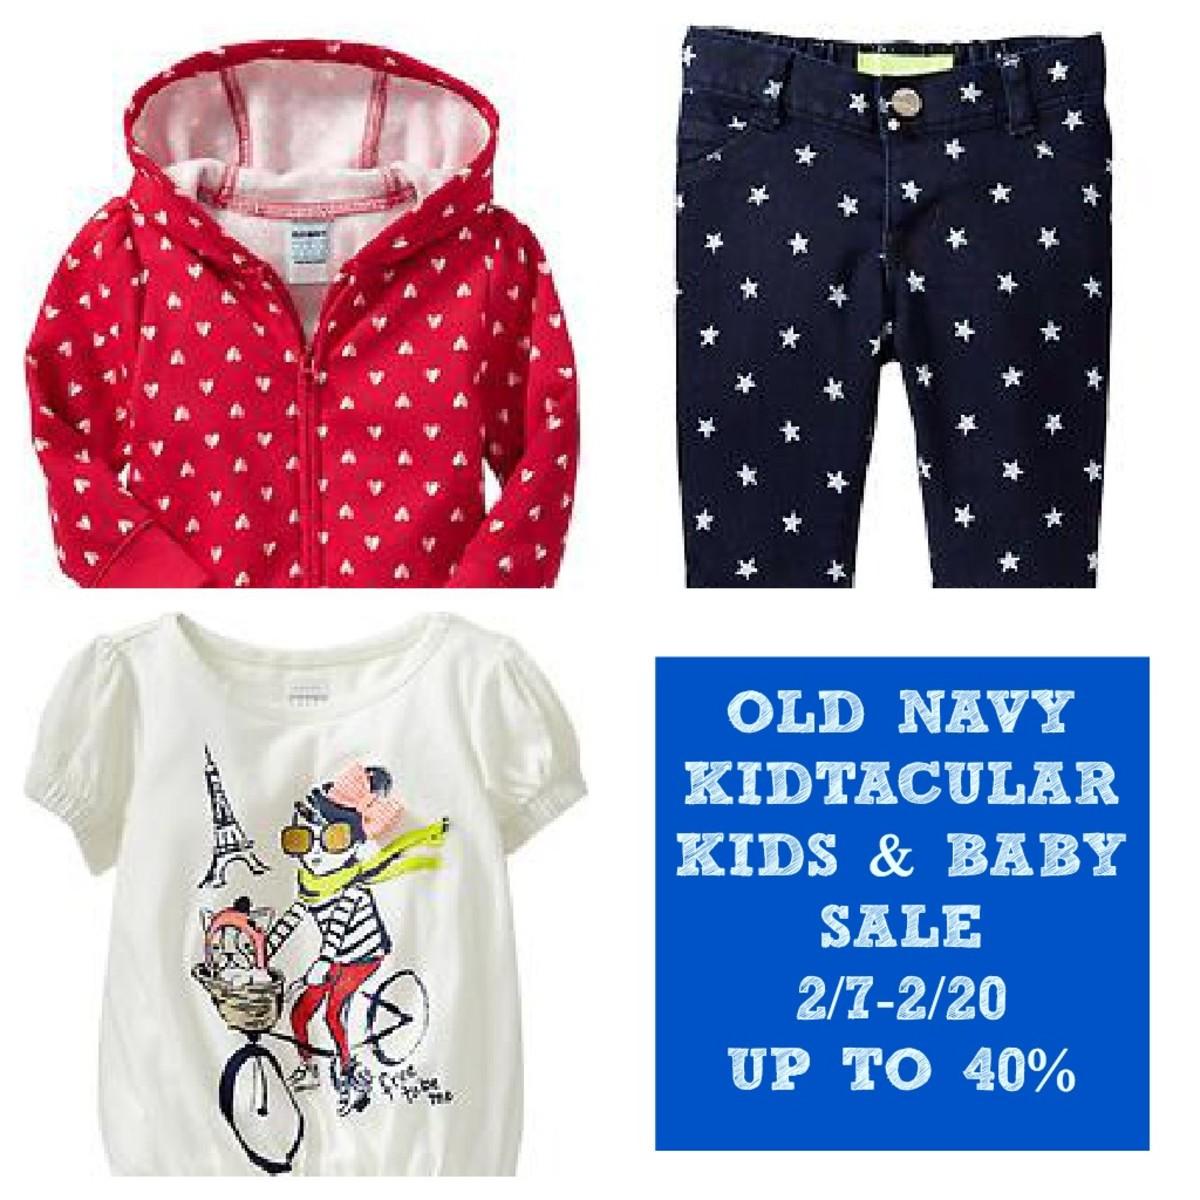 Old Navy Kids & Baby Sale Plus Pinterest Contest! - MomTrends